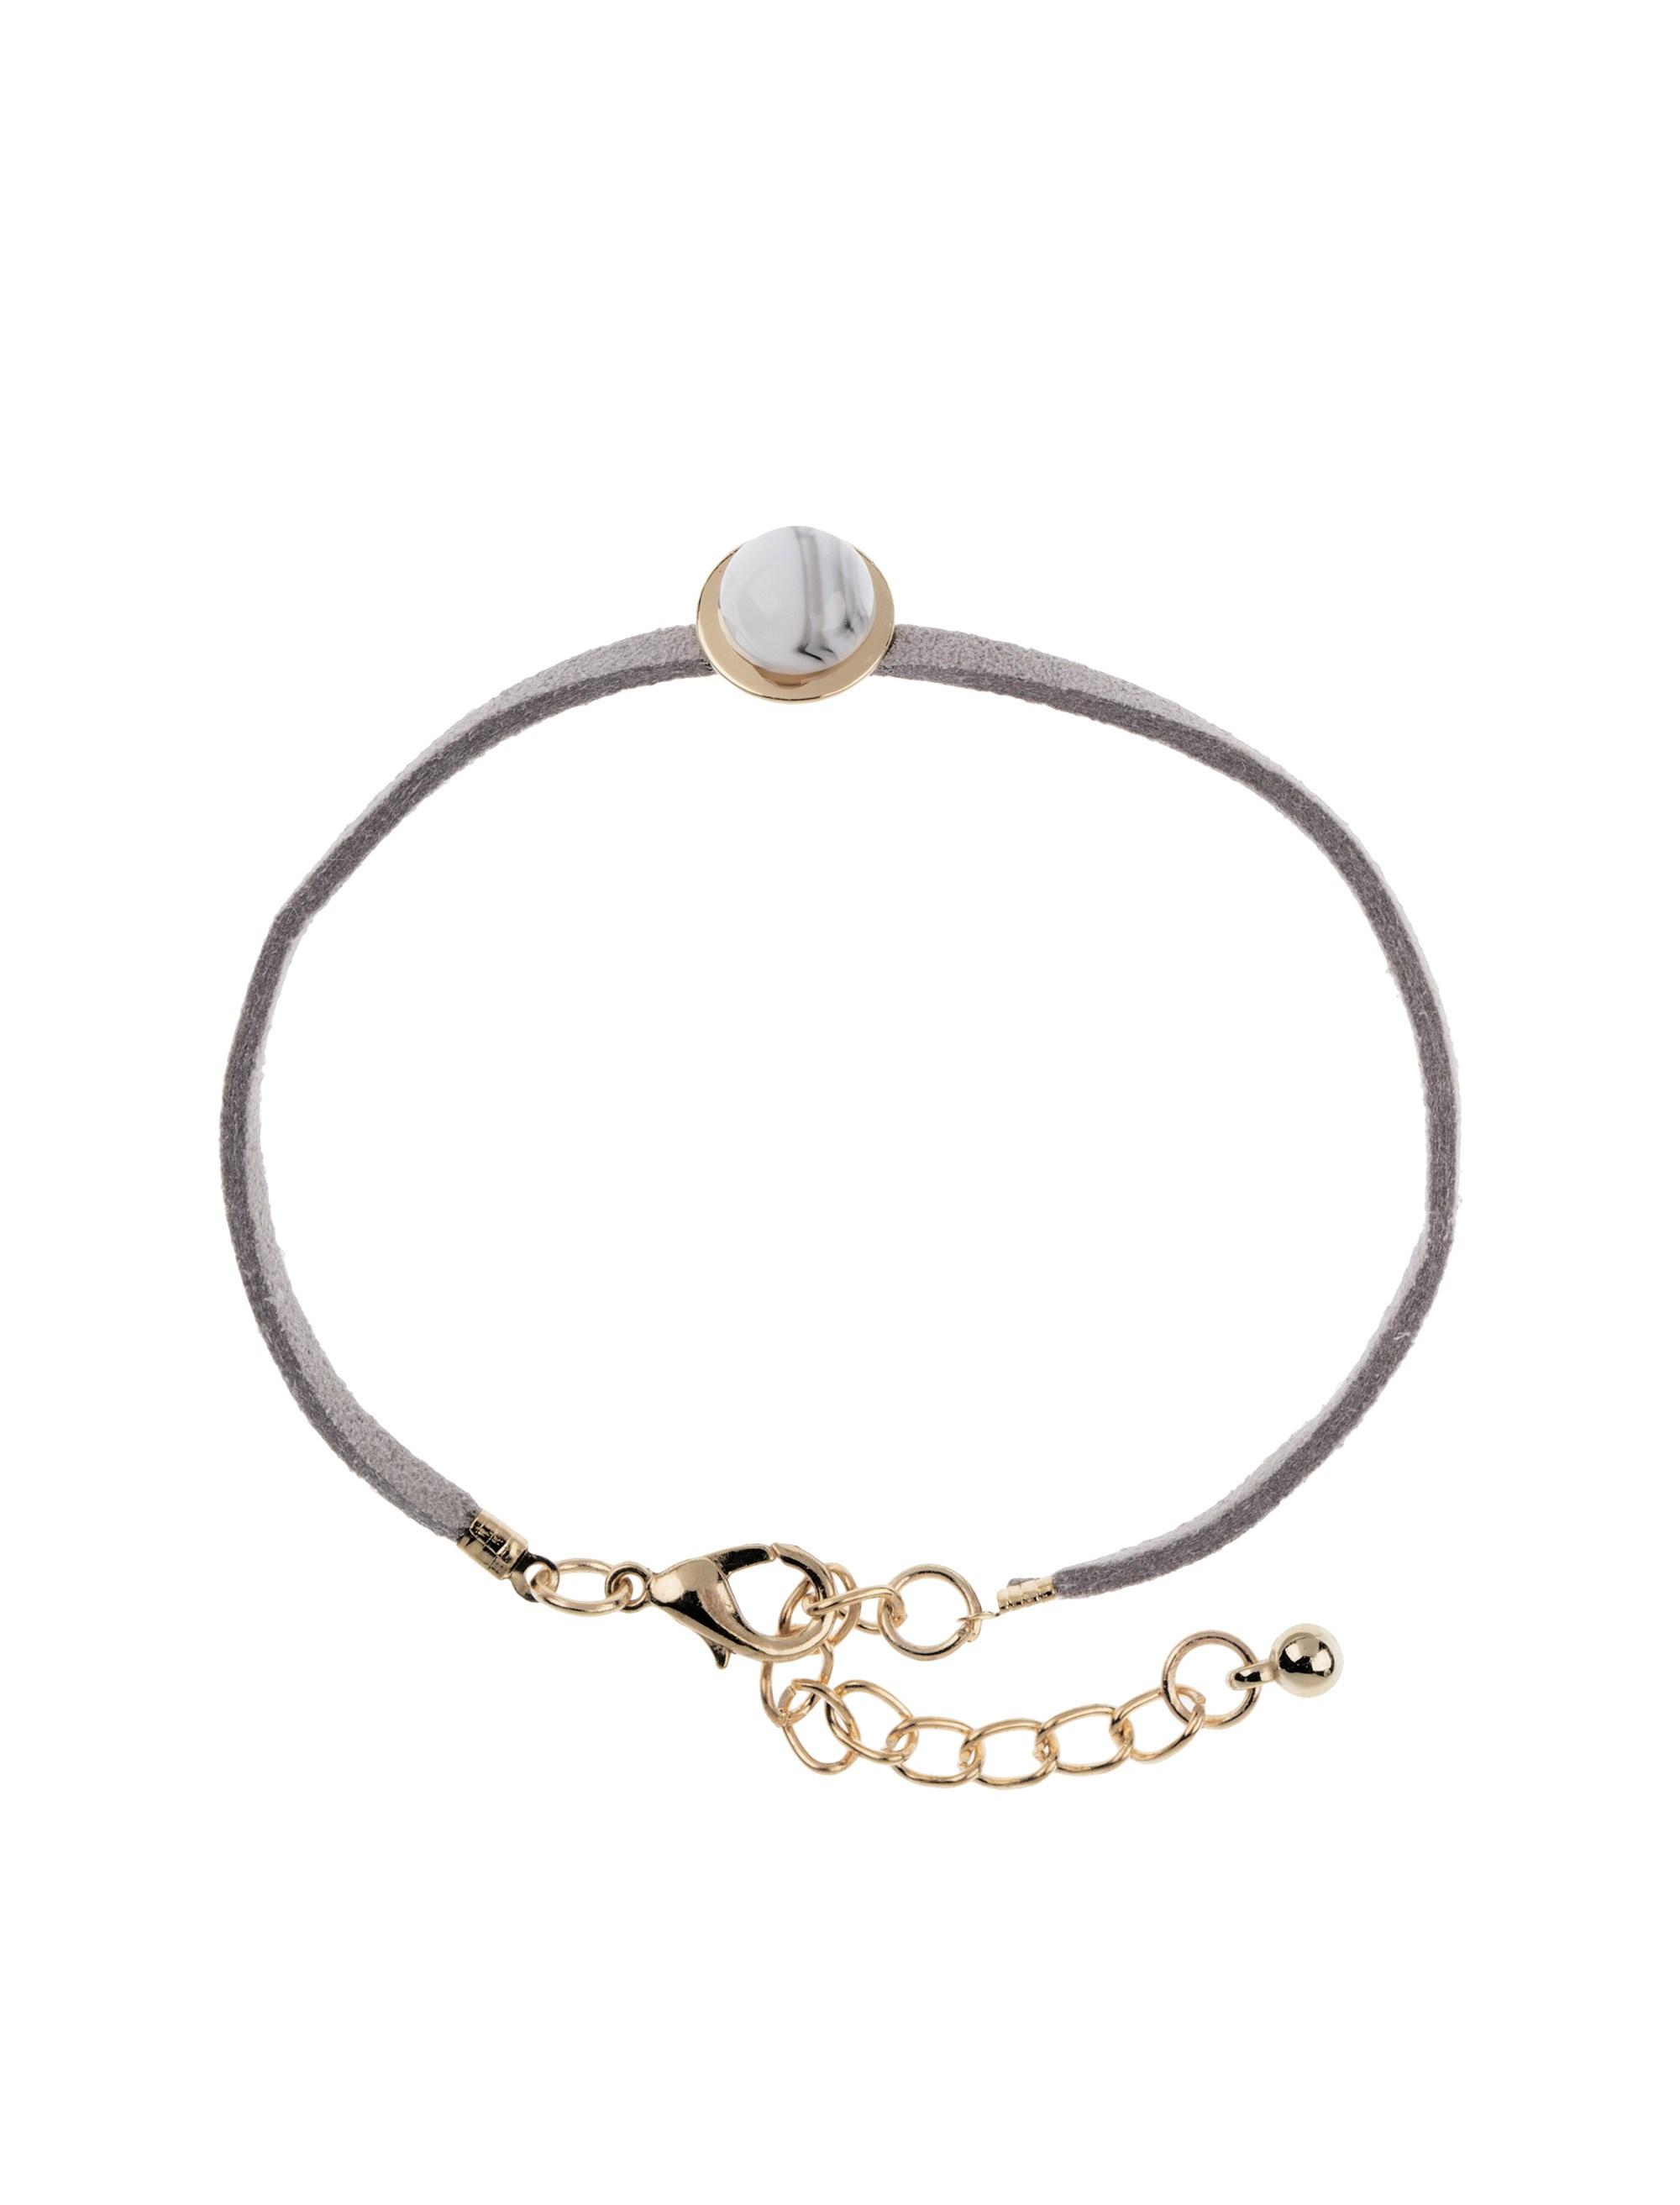 دستبند زنانه بسته 3 عددی - کوتون - طلايي/ طوسي - 7